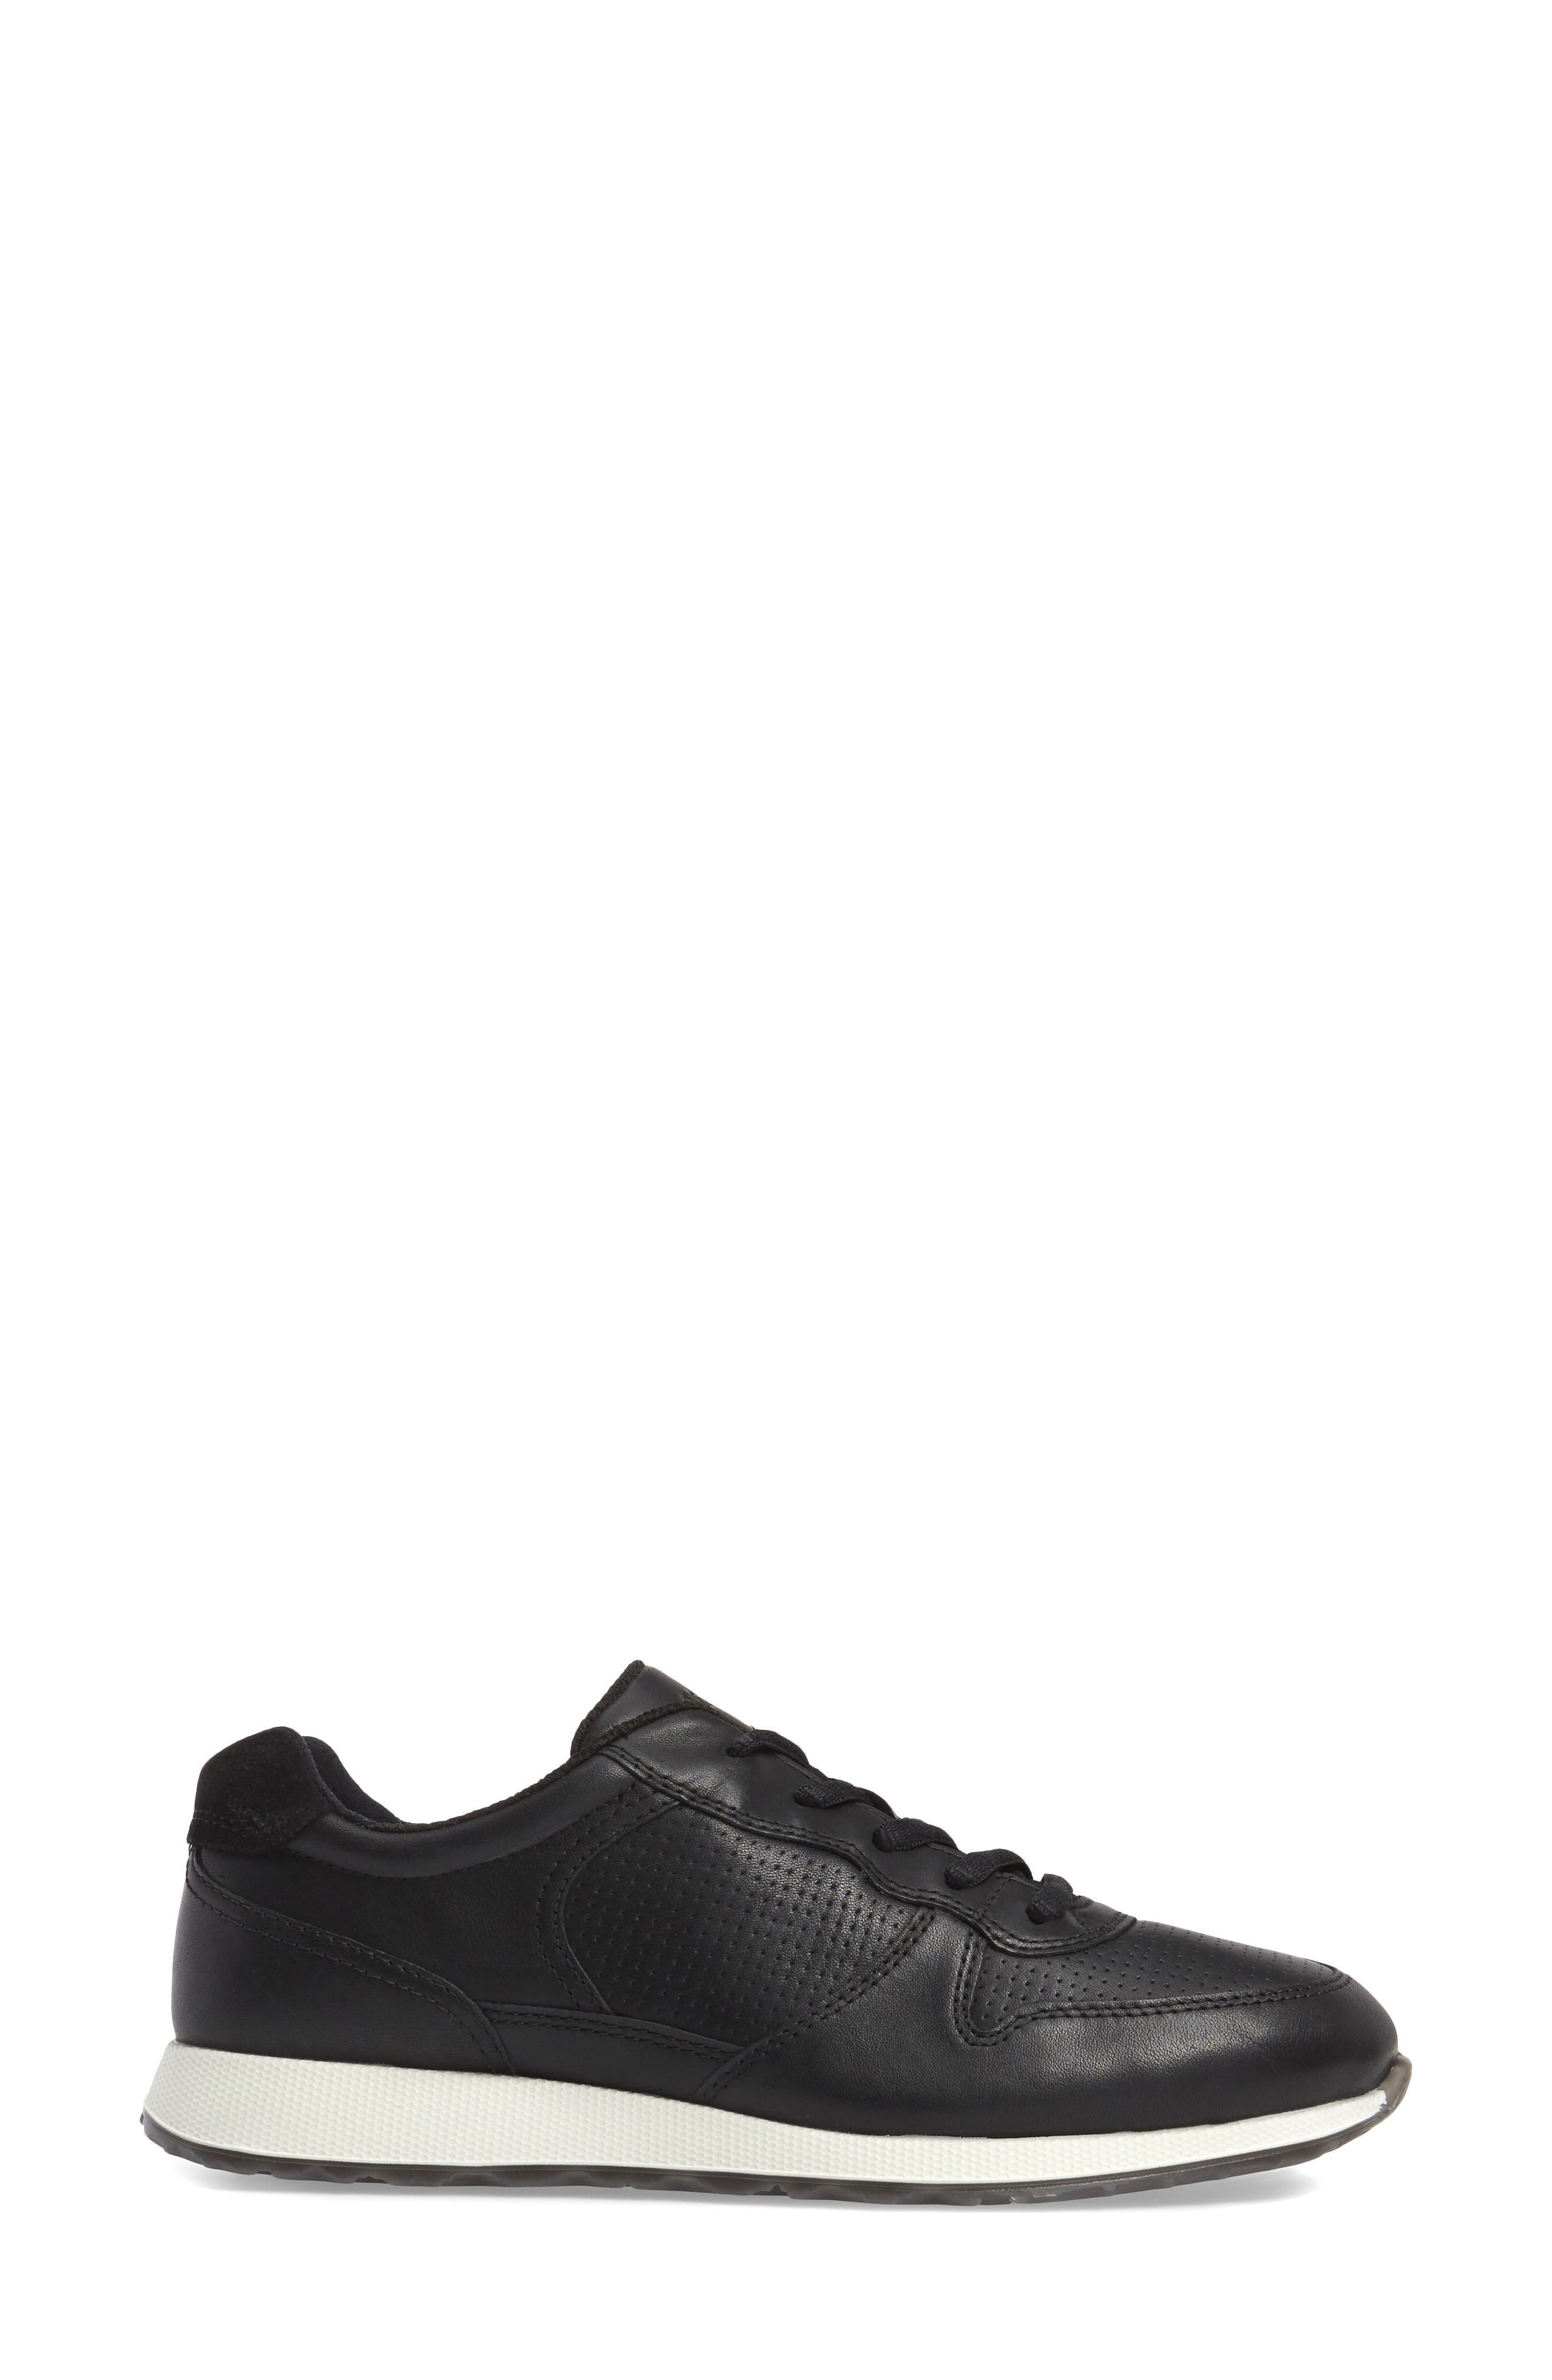 Performance Sneaker,                             Alternate thumbnail 3, color,                             001